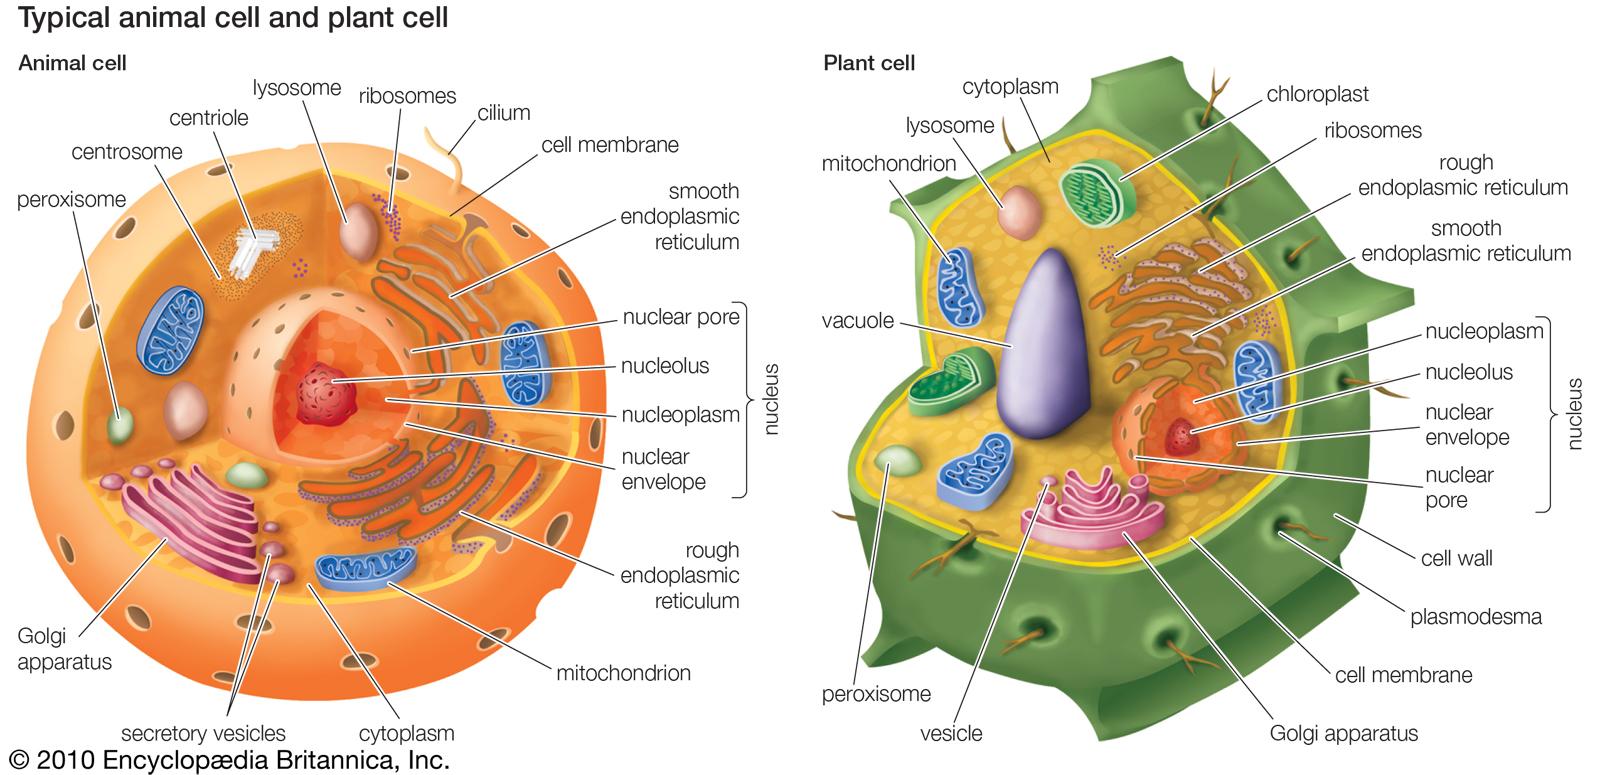 hight resolution of plant cell v animal cell venn diagram